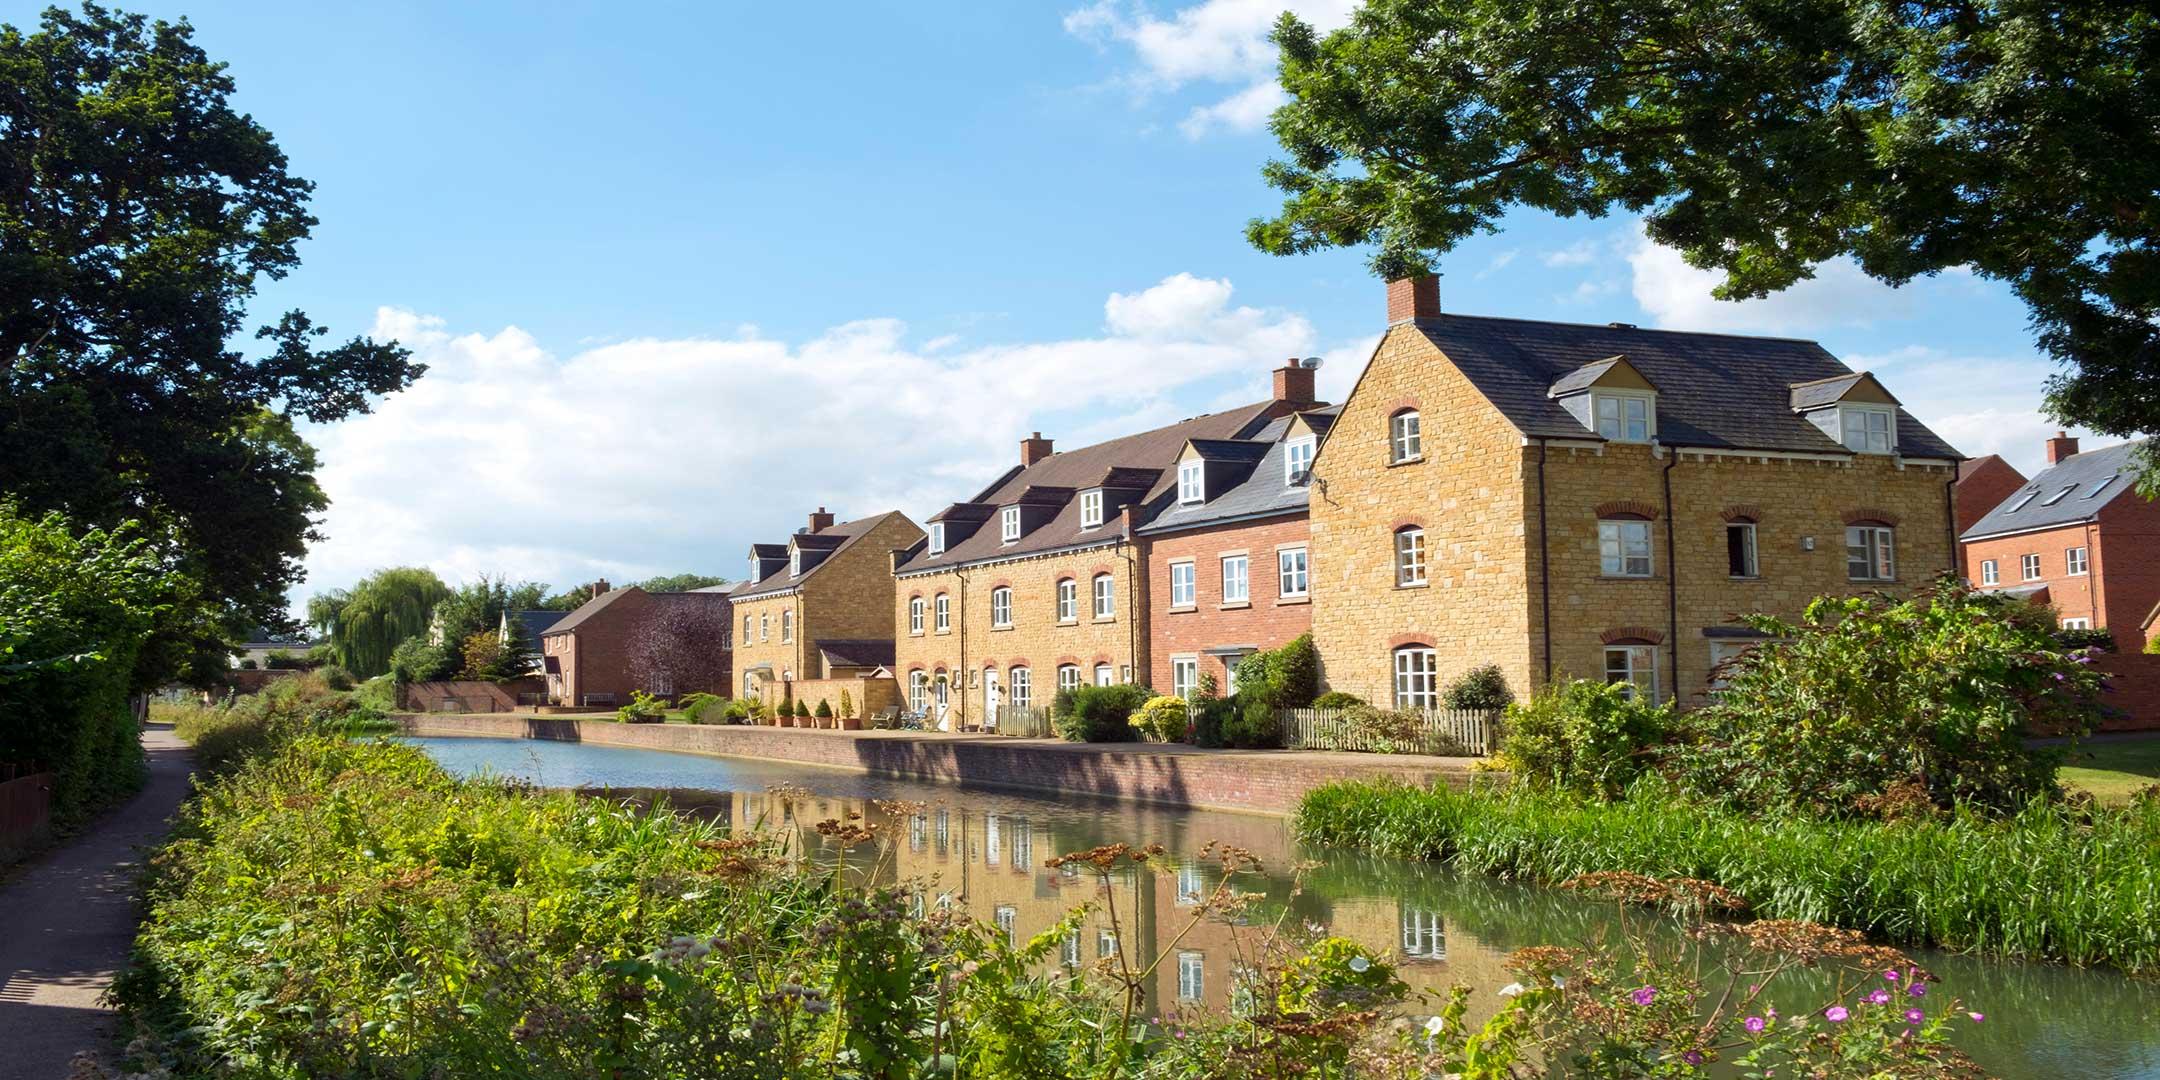 5 key benefits of drainage design software